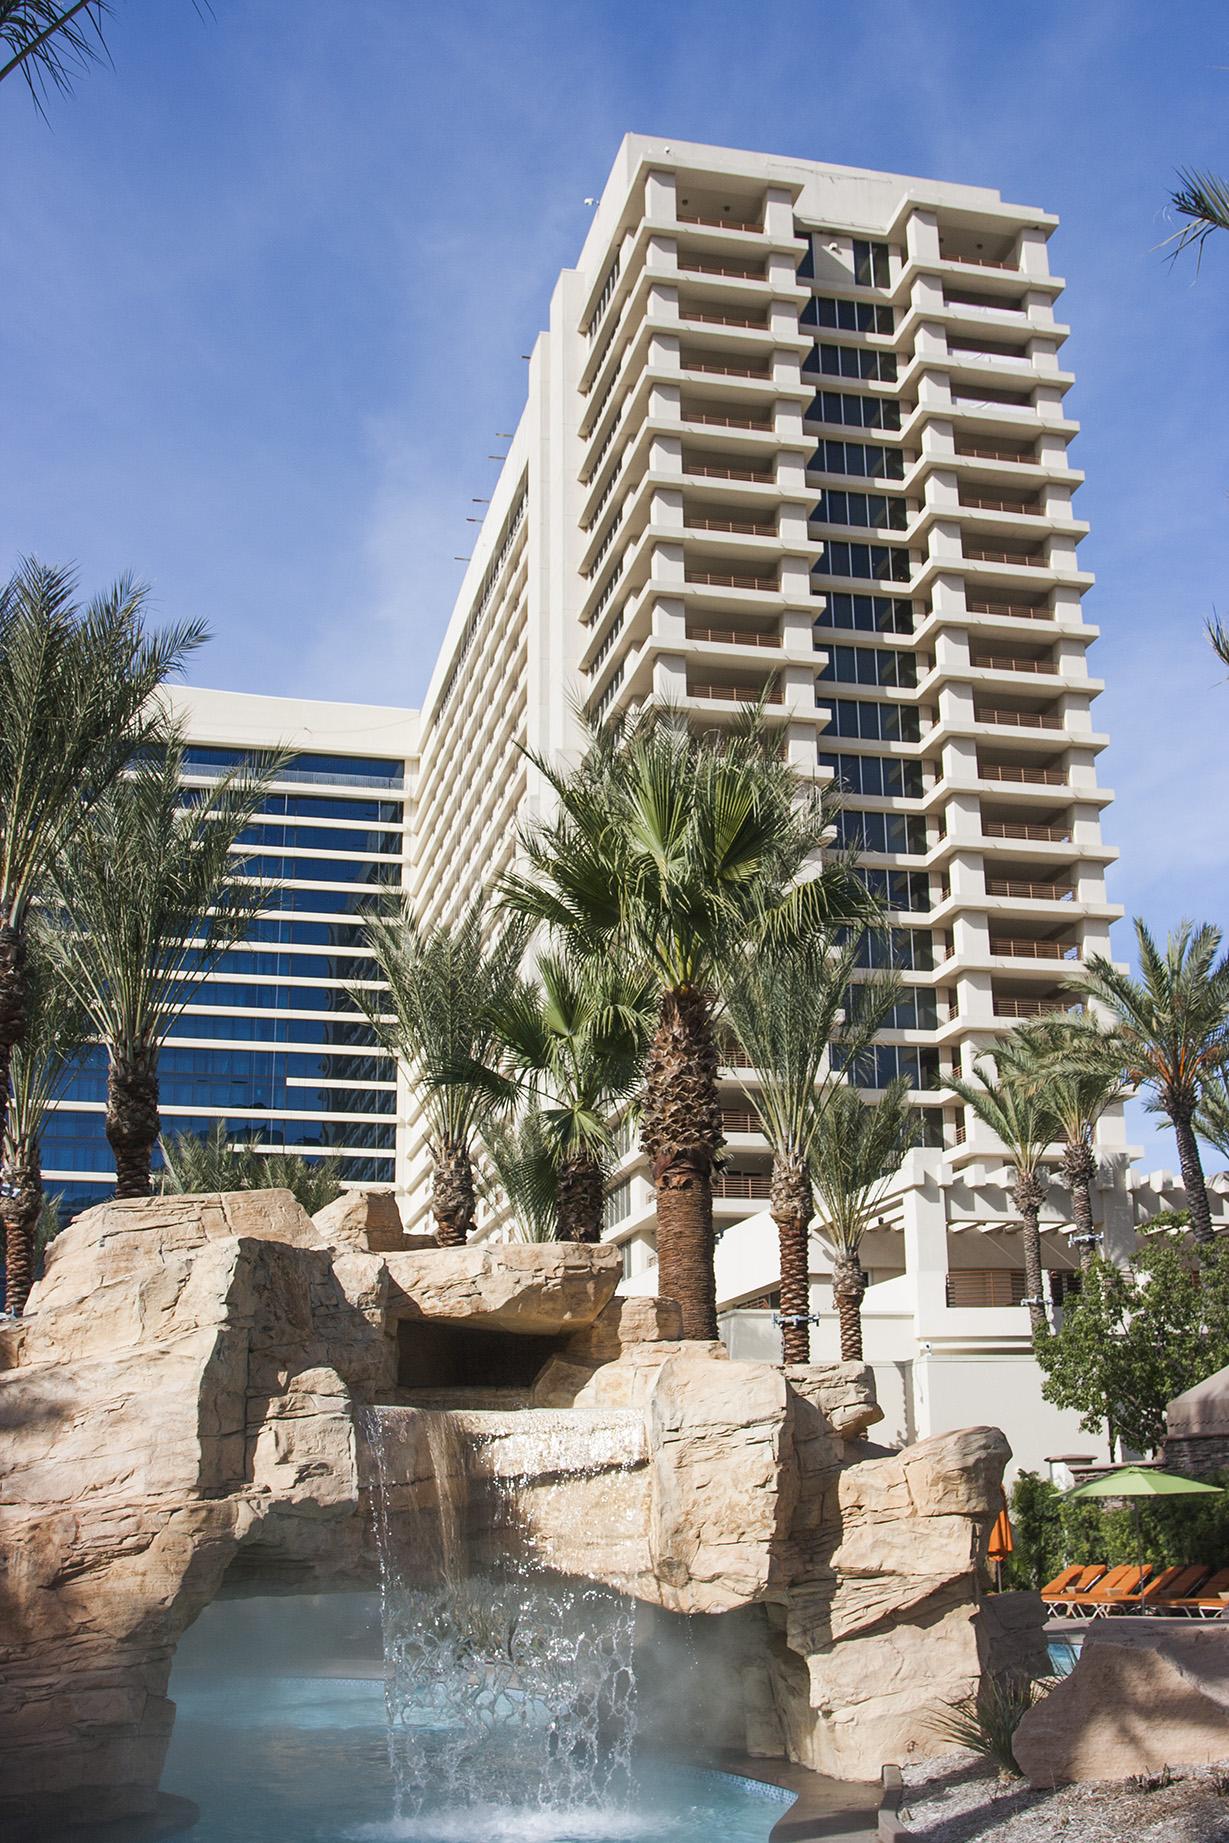 Resort casinos in southern california casino connecticut london new